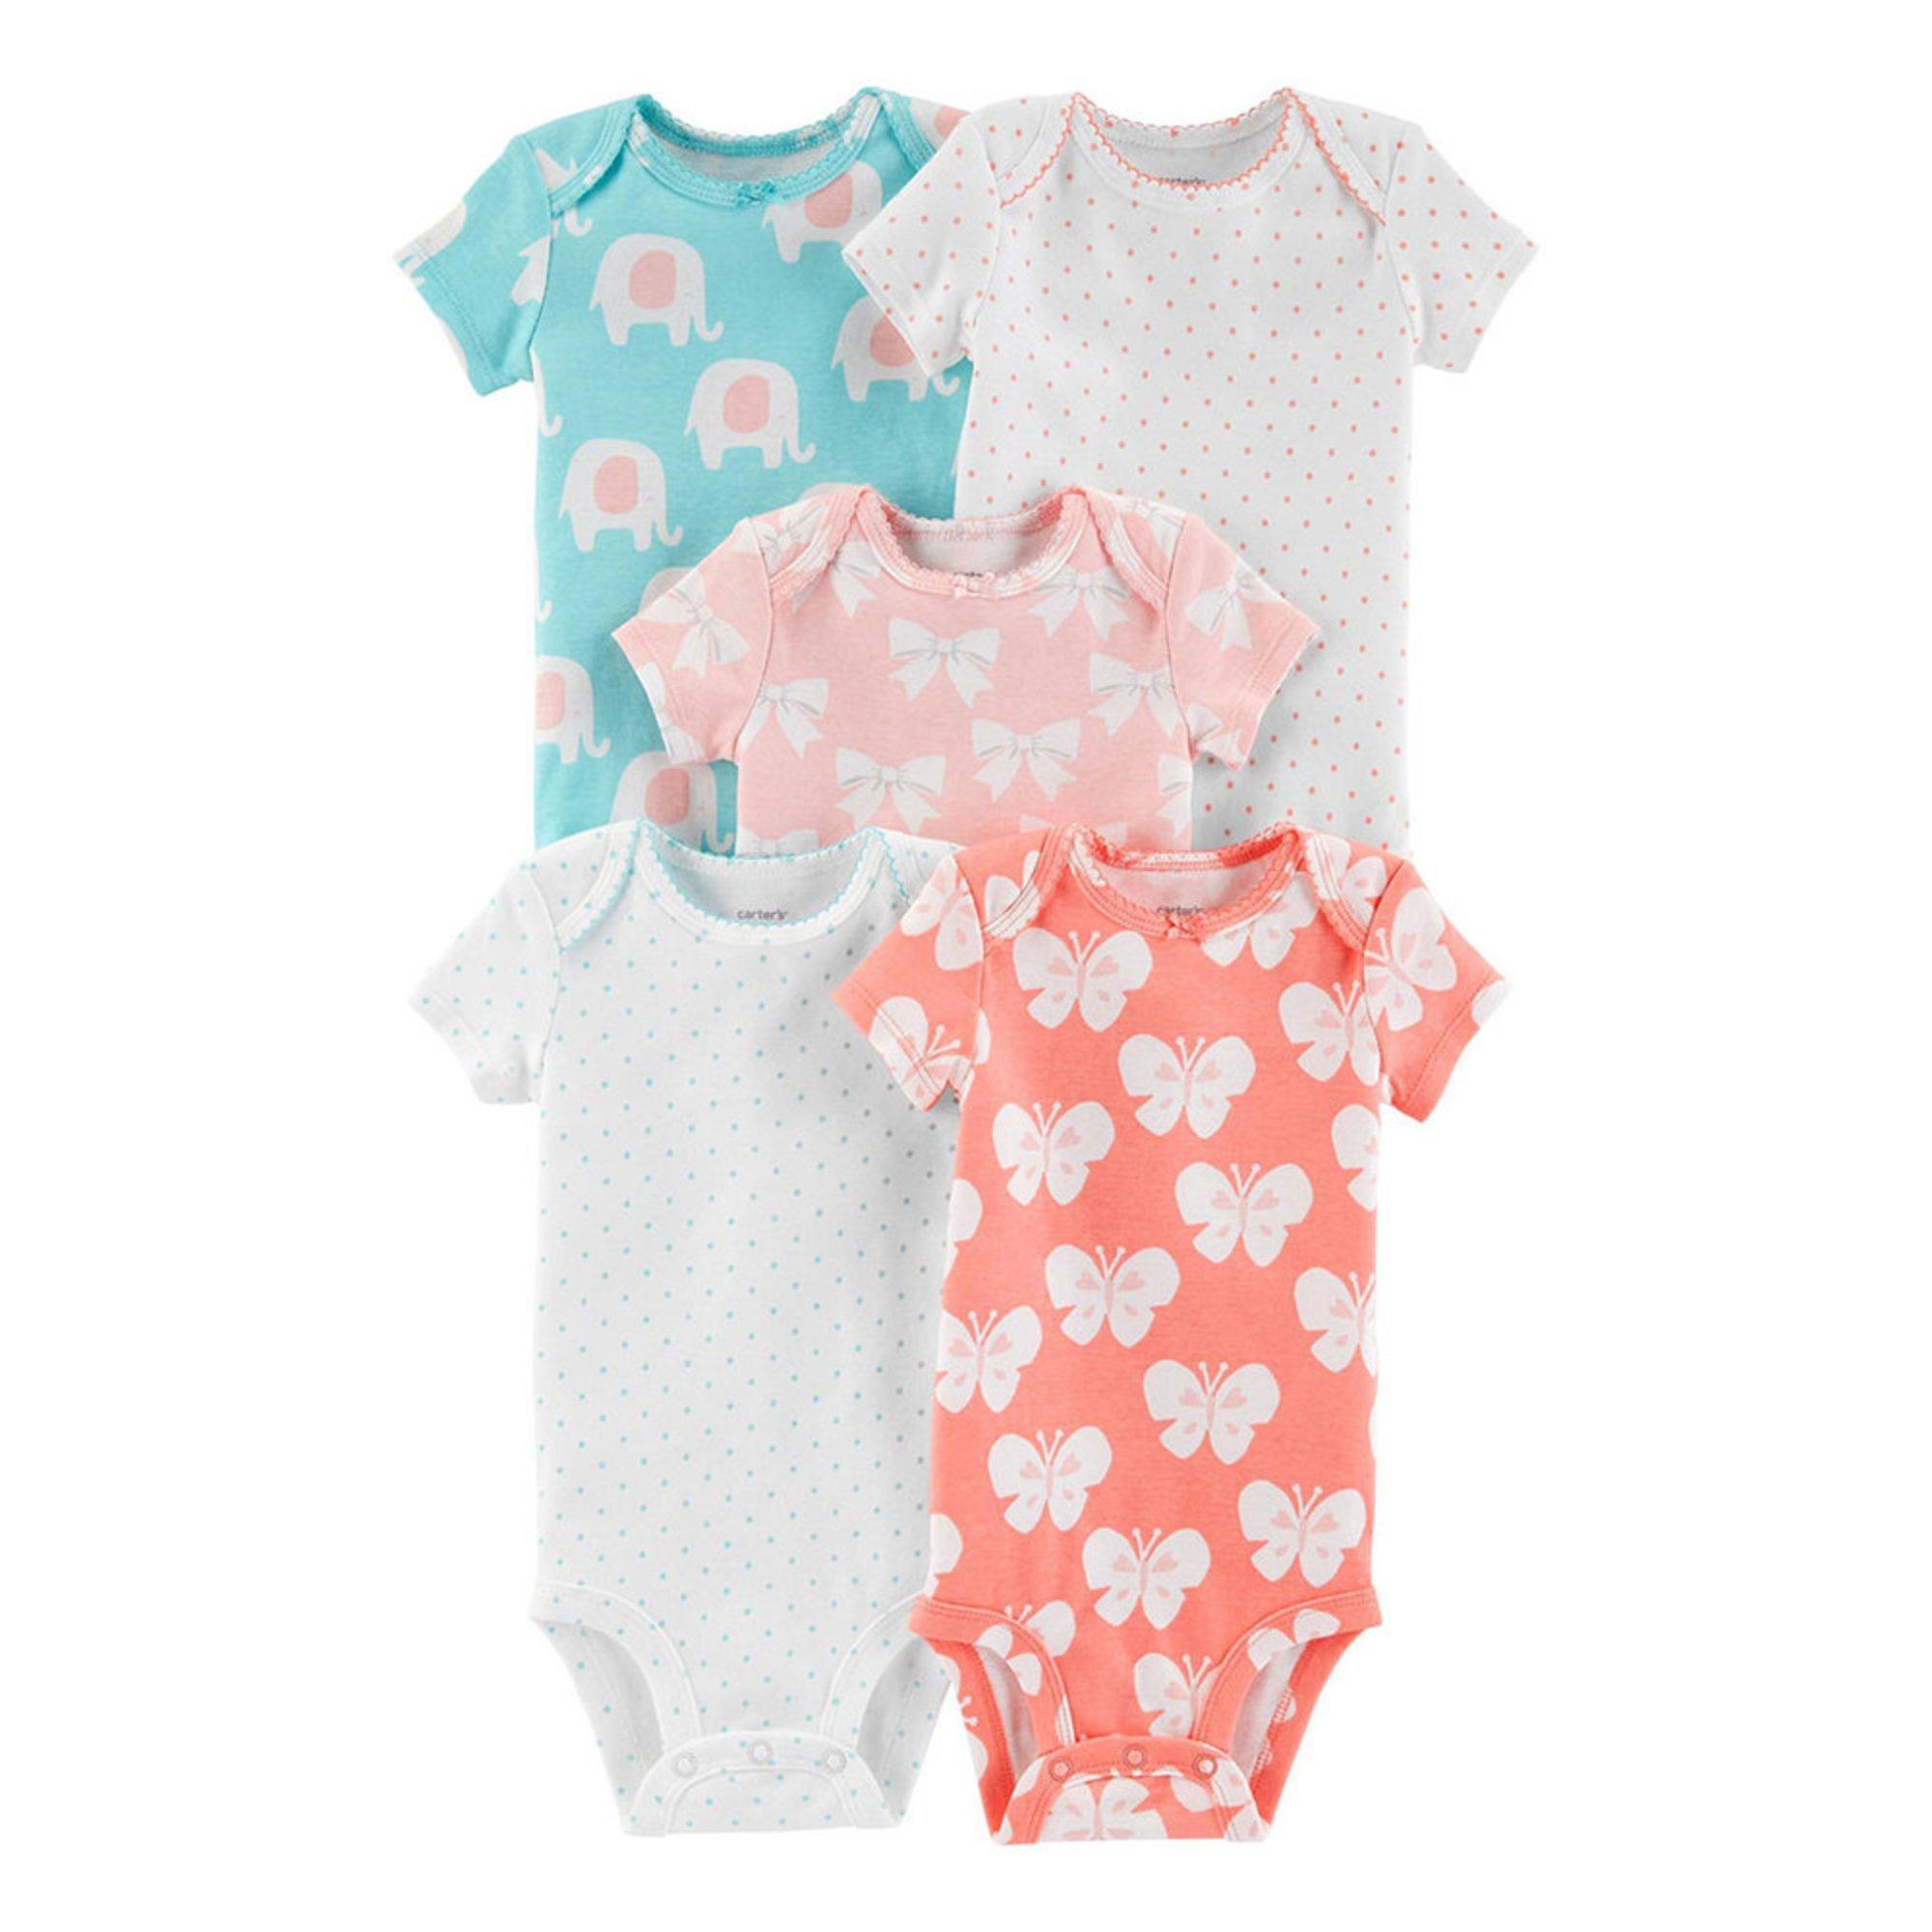 0fa4f49de Carter's Baby Girls' 5-pack Bodysuit Set   Baby Girls' One Piece ...